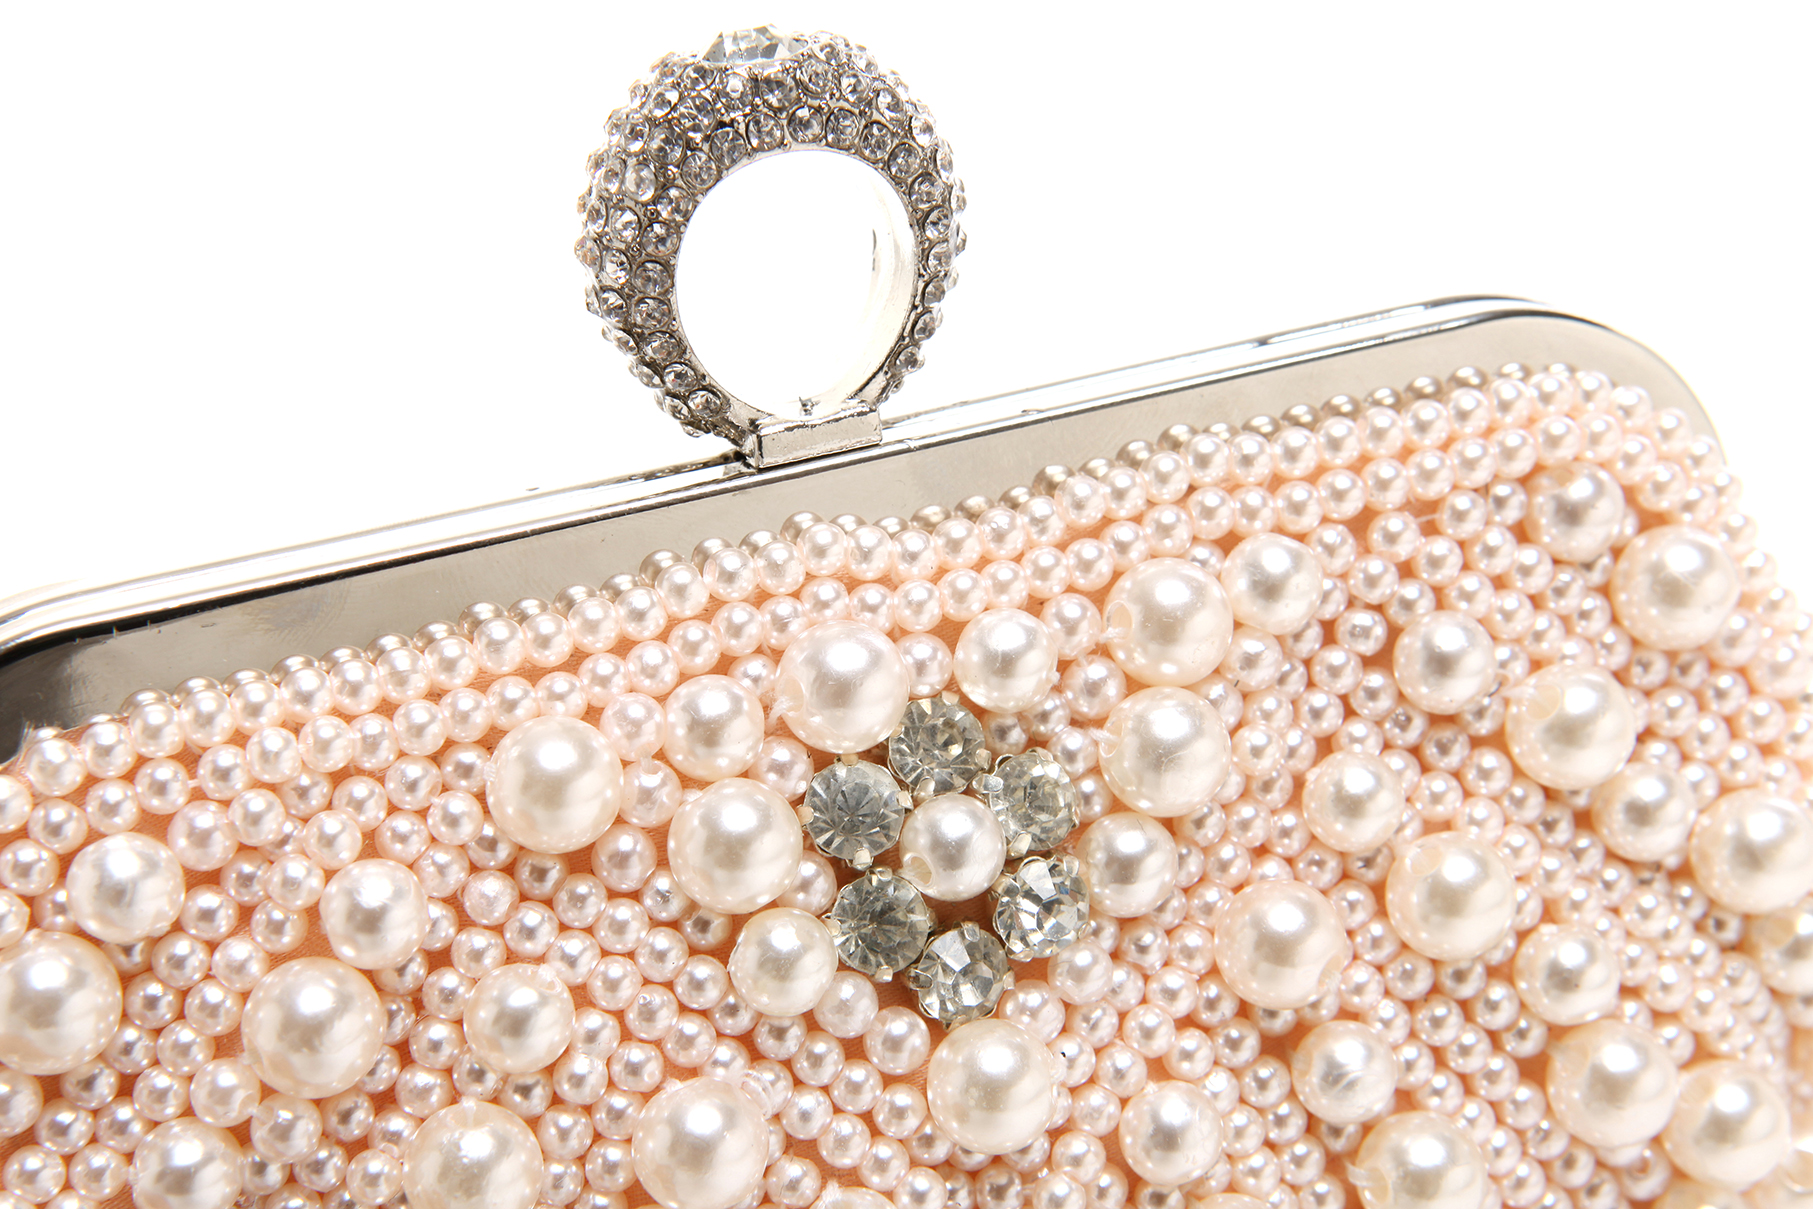 TIANA Champagne Pearl Rhinestone Evening Bag closeup